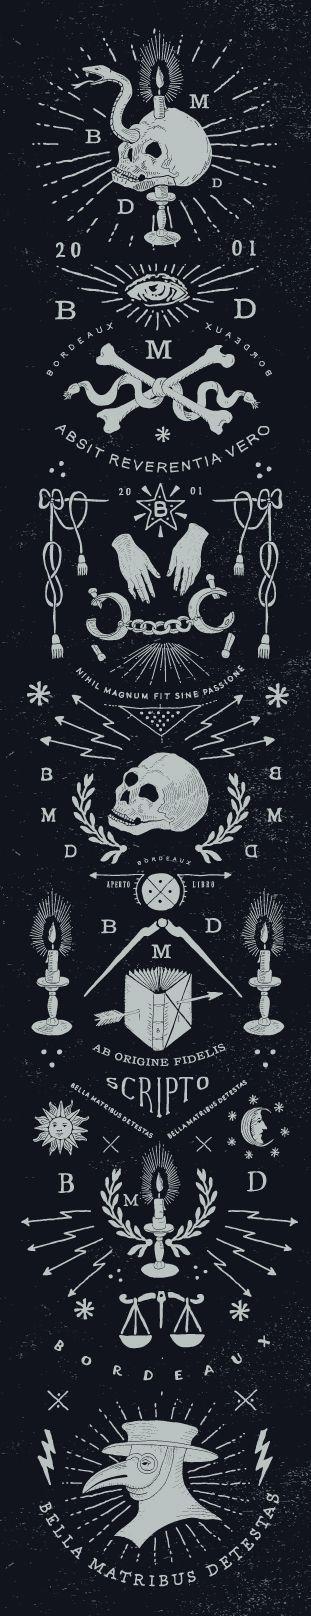 Bmd Graphic Design